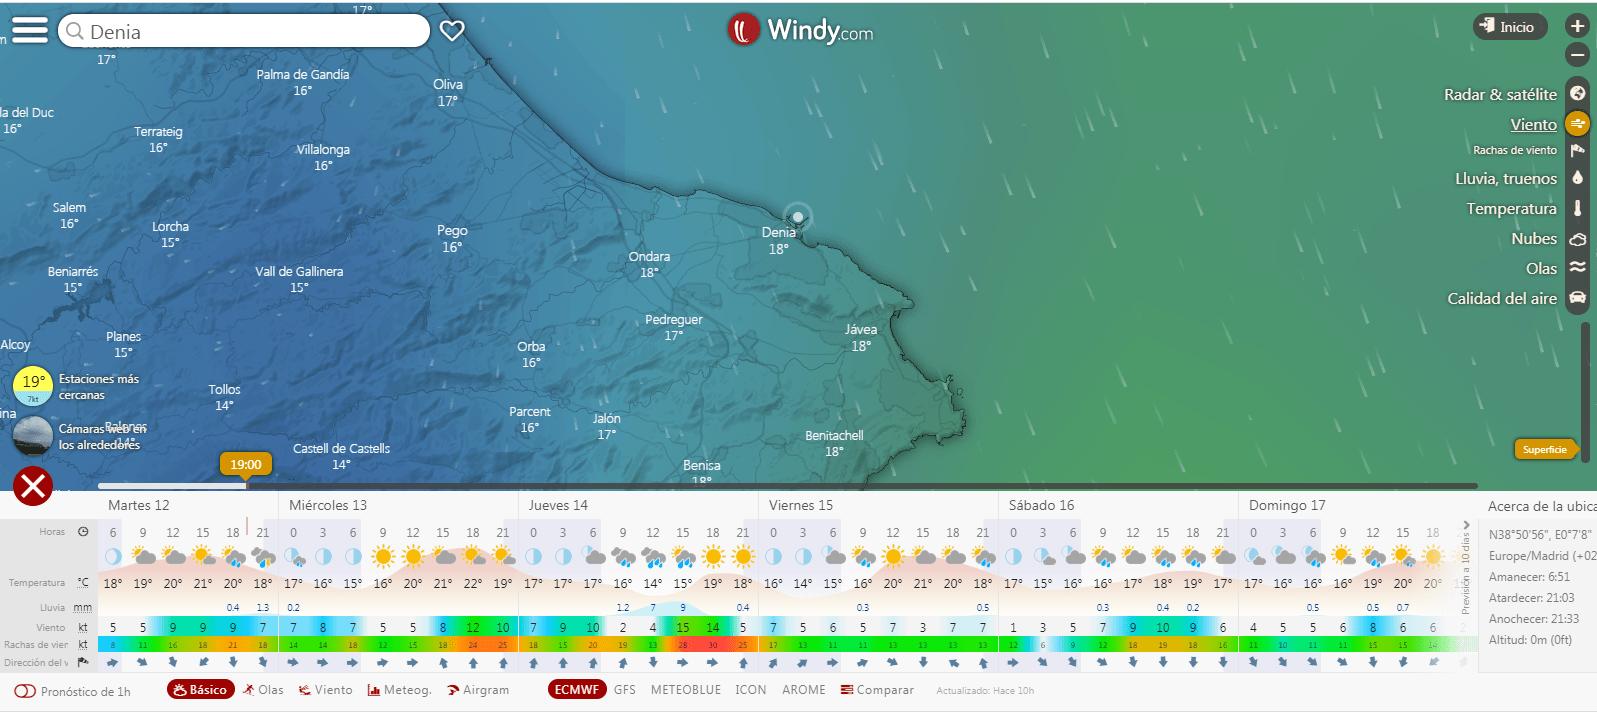 Wind forecast in meteorological web